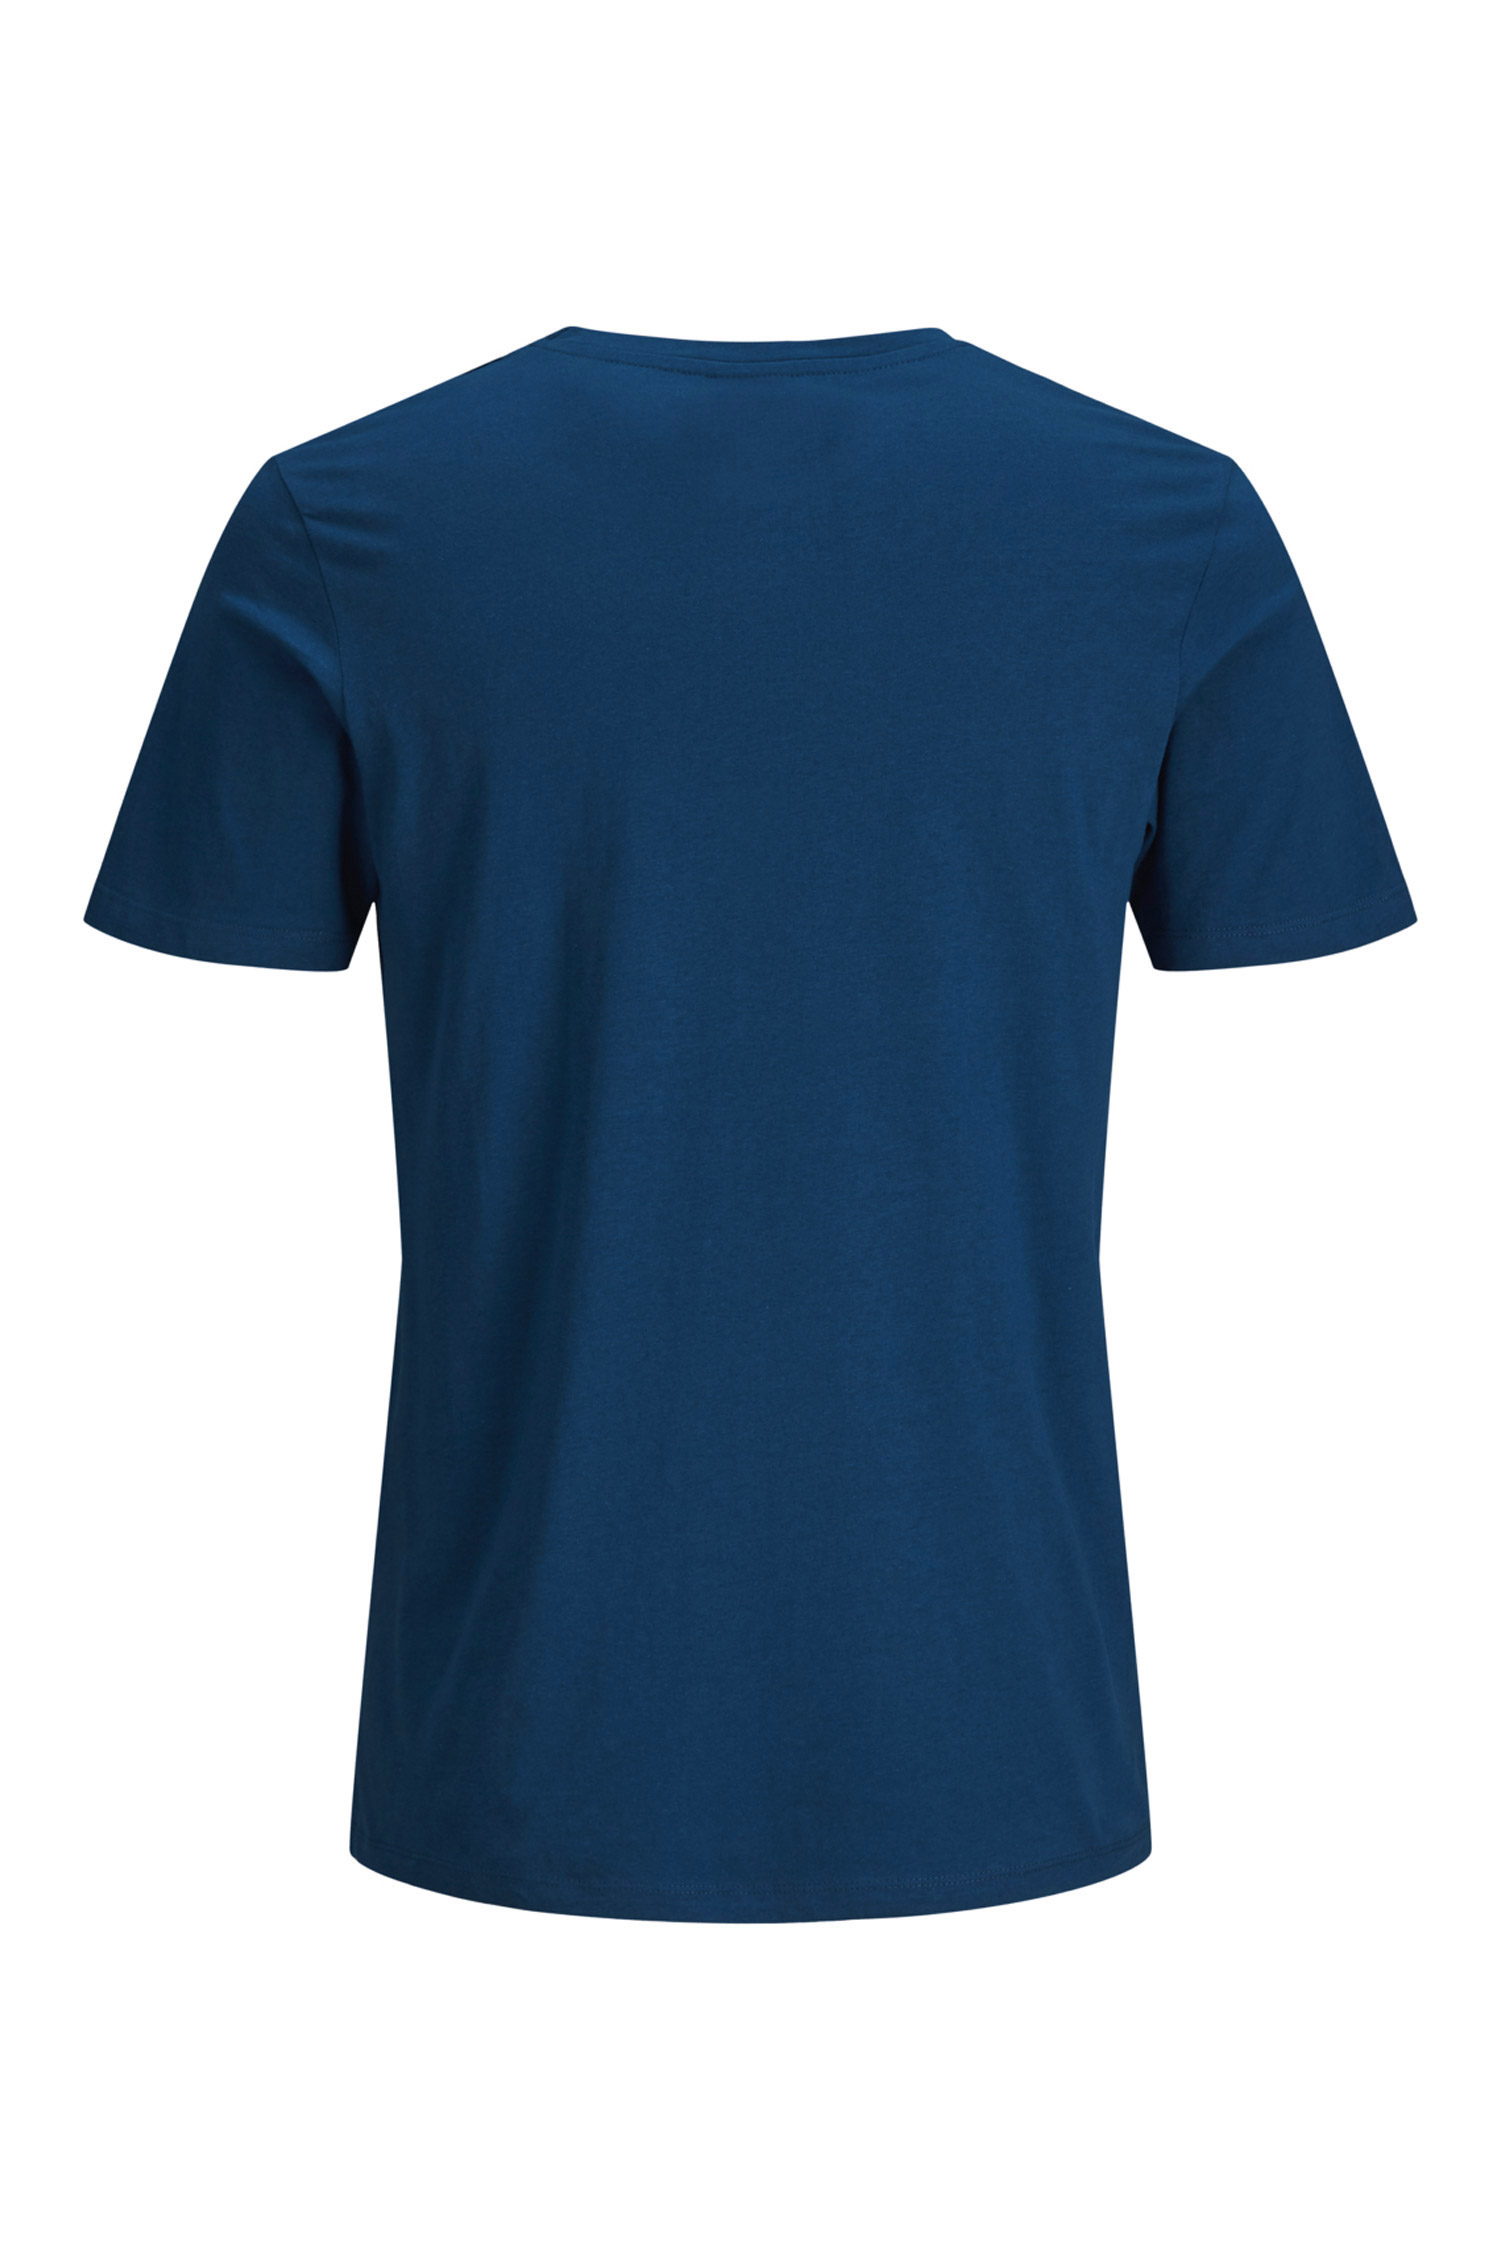 Sport, Camisetas M. Corta, 110088, ROYAL | Zoom